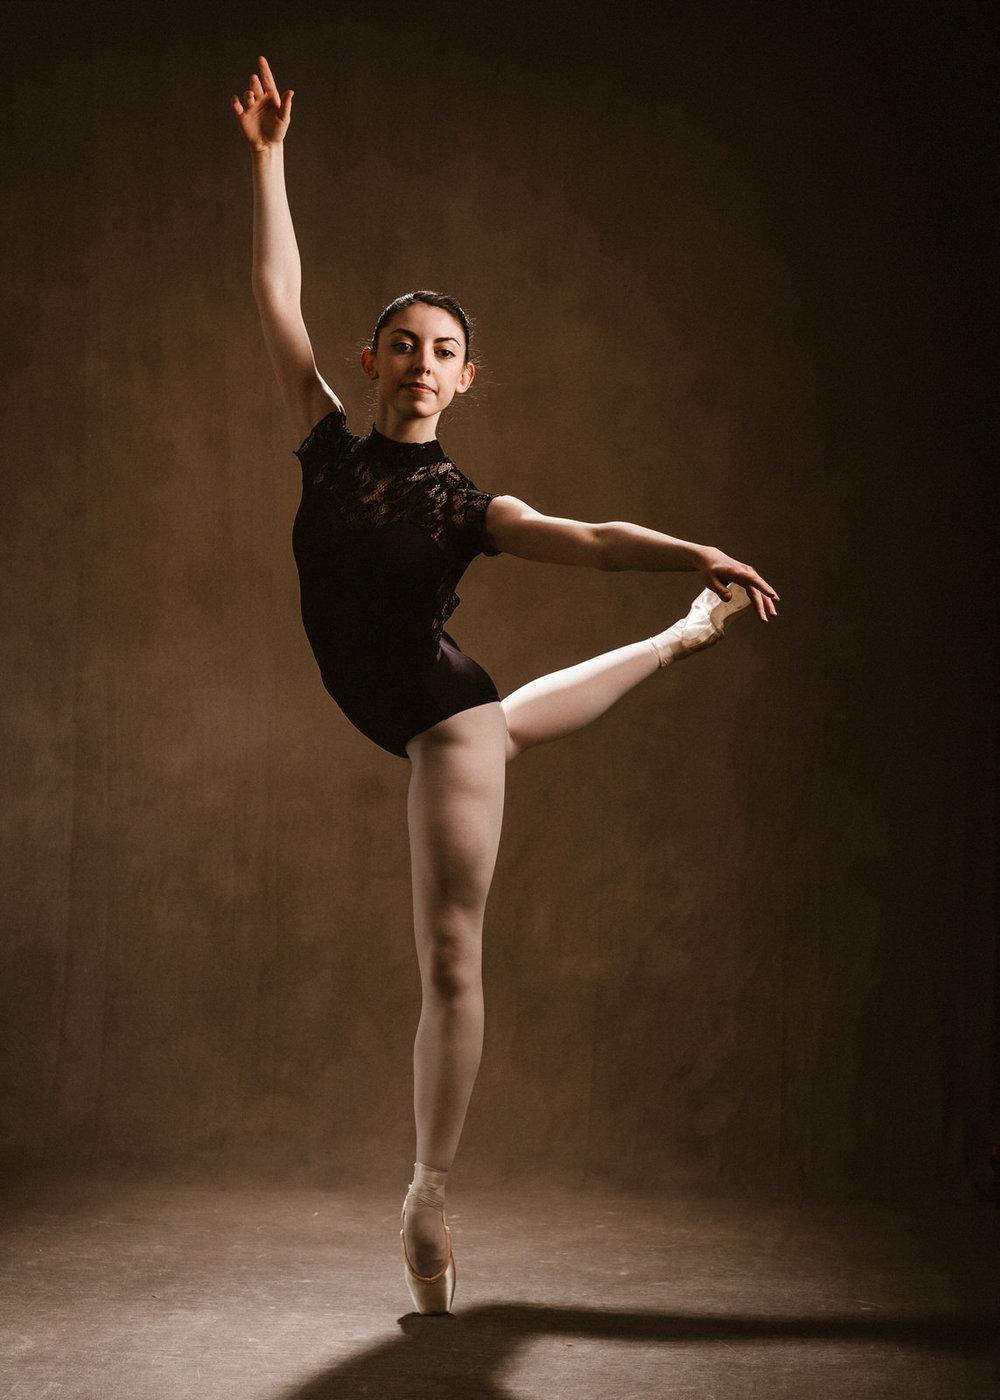 Sarah_Nolan_Ballet_003.jpg